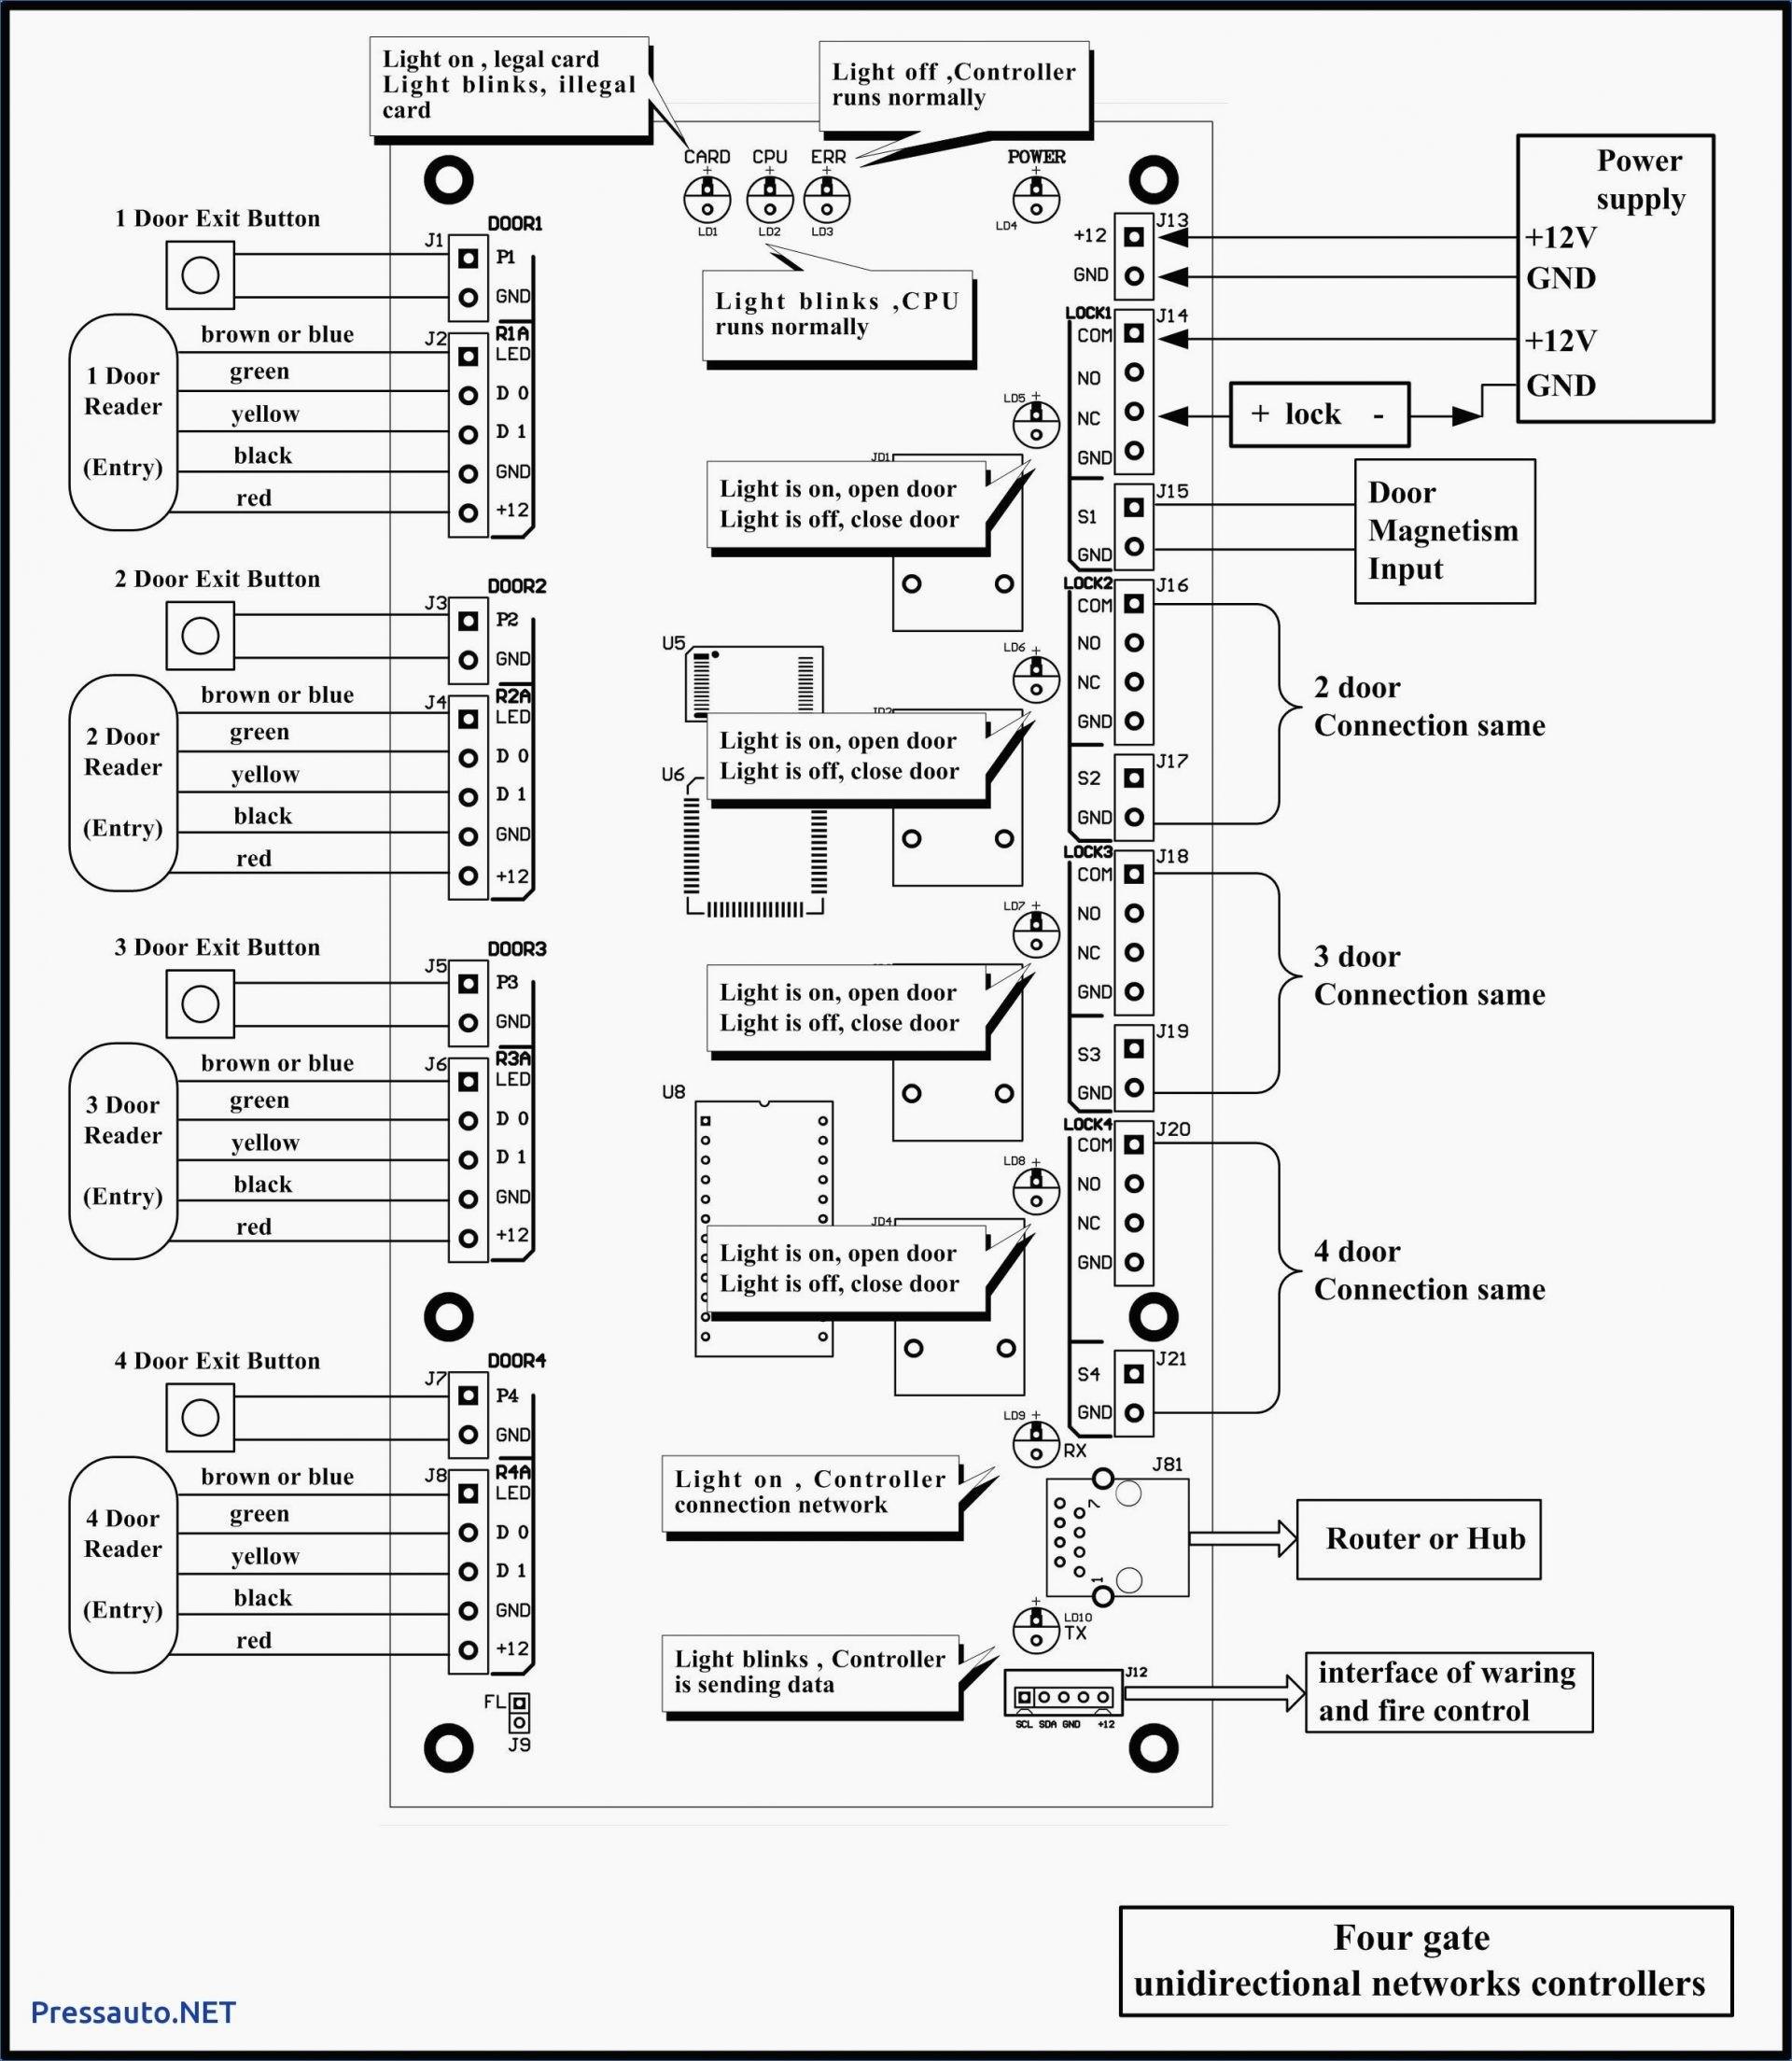 Wire Diagram Kenwood Kdc 210U - All Wiring Diagram Data - Kenwood Kdc 210U Wiring Diagram